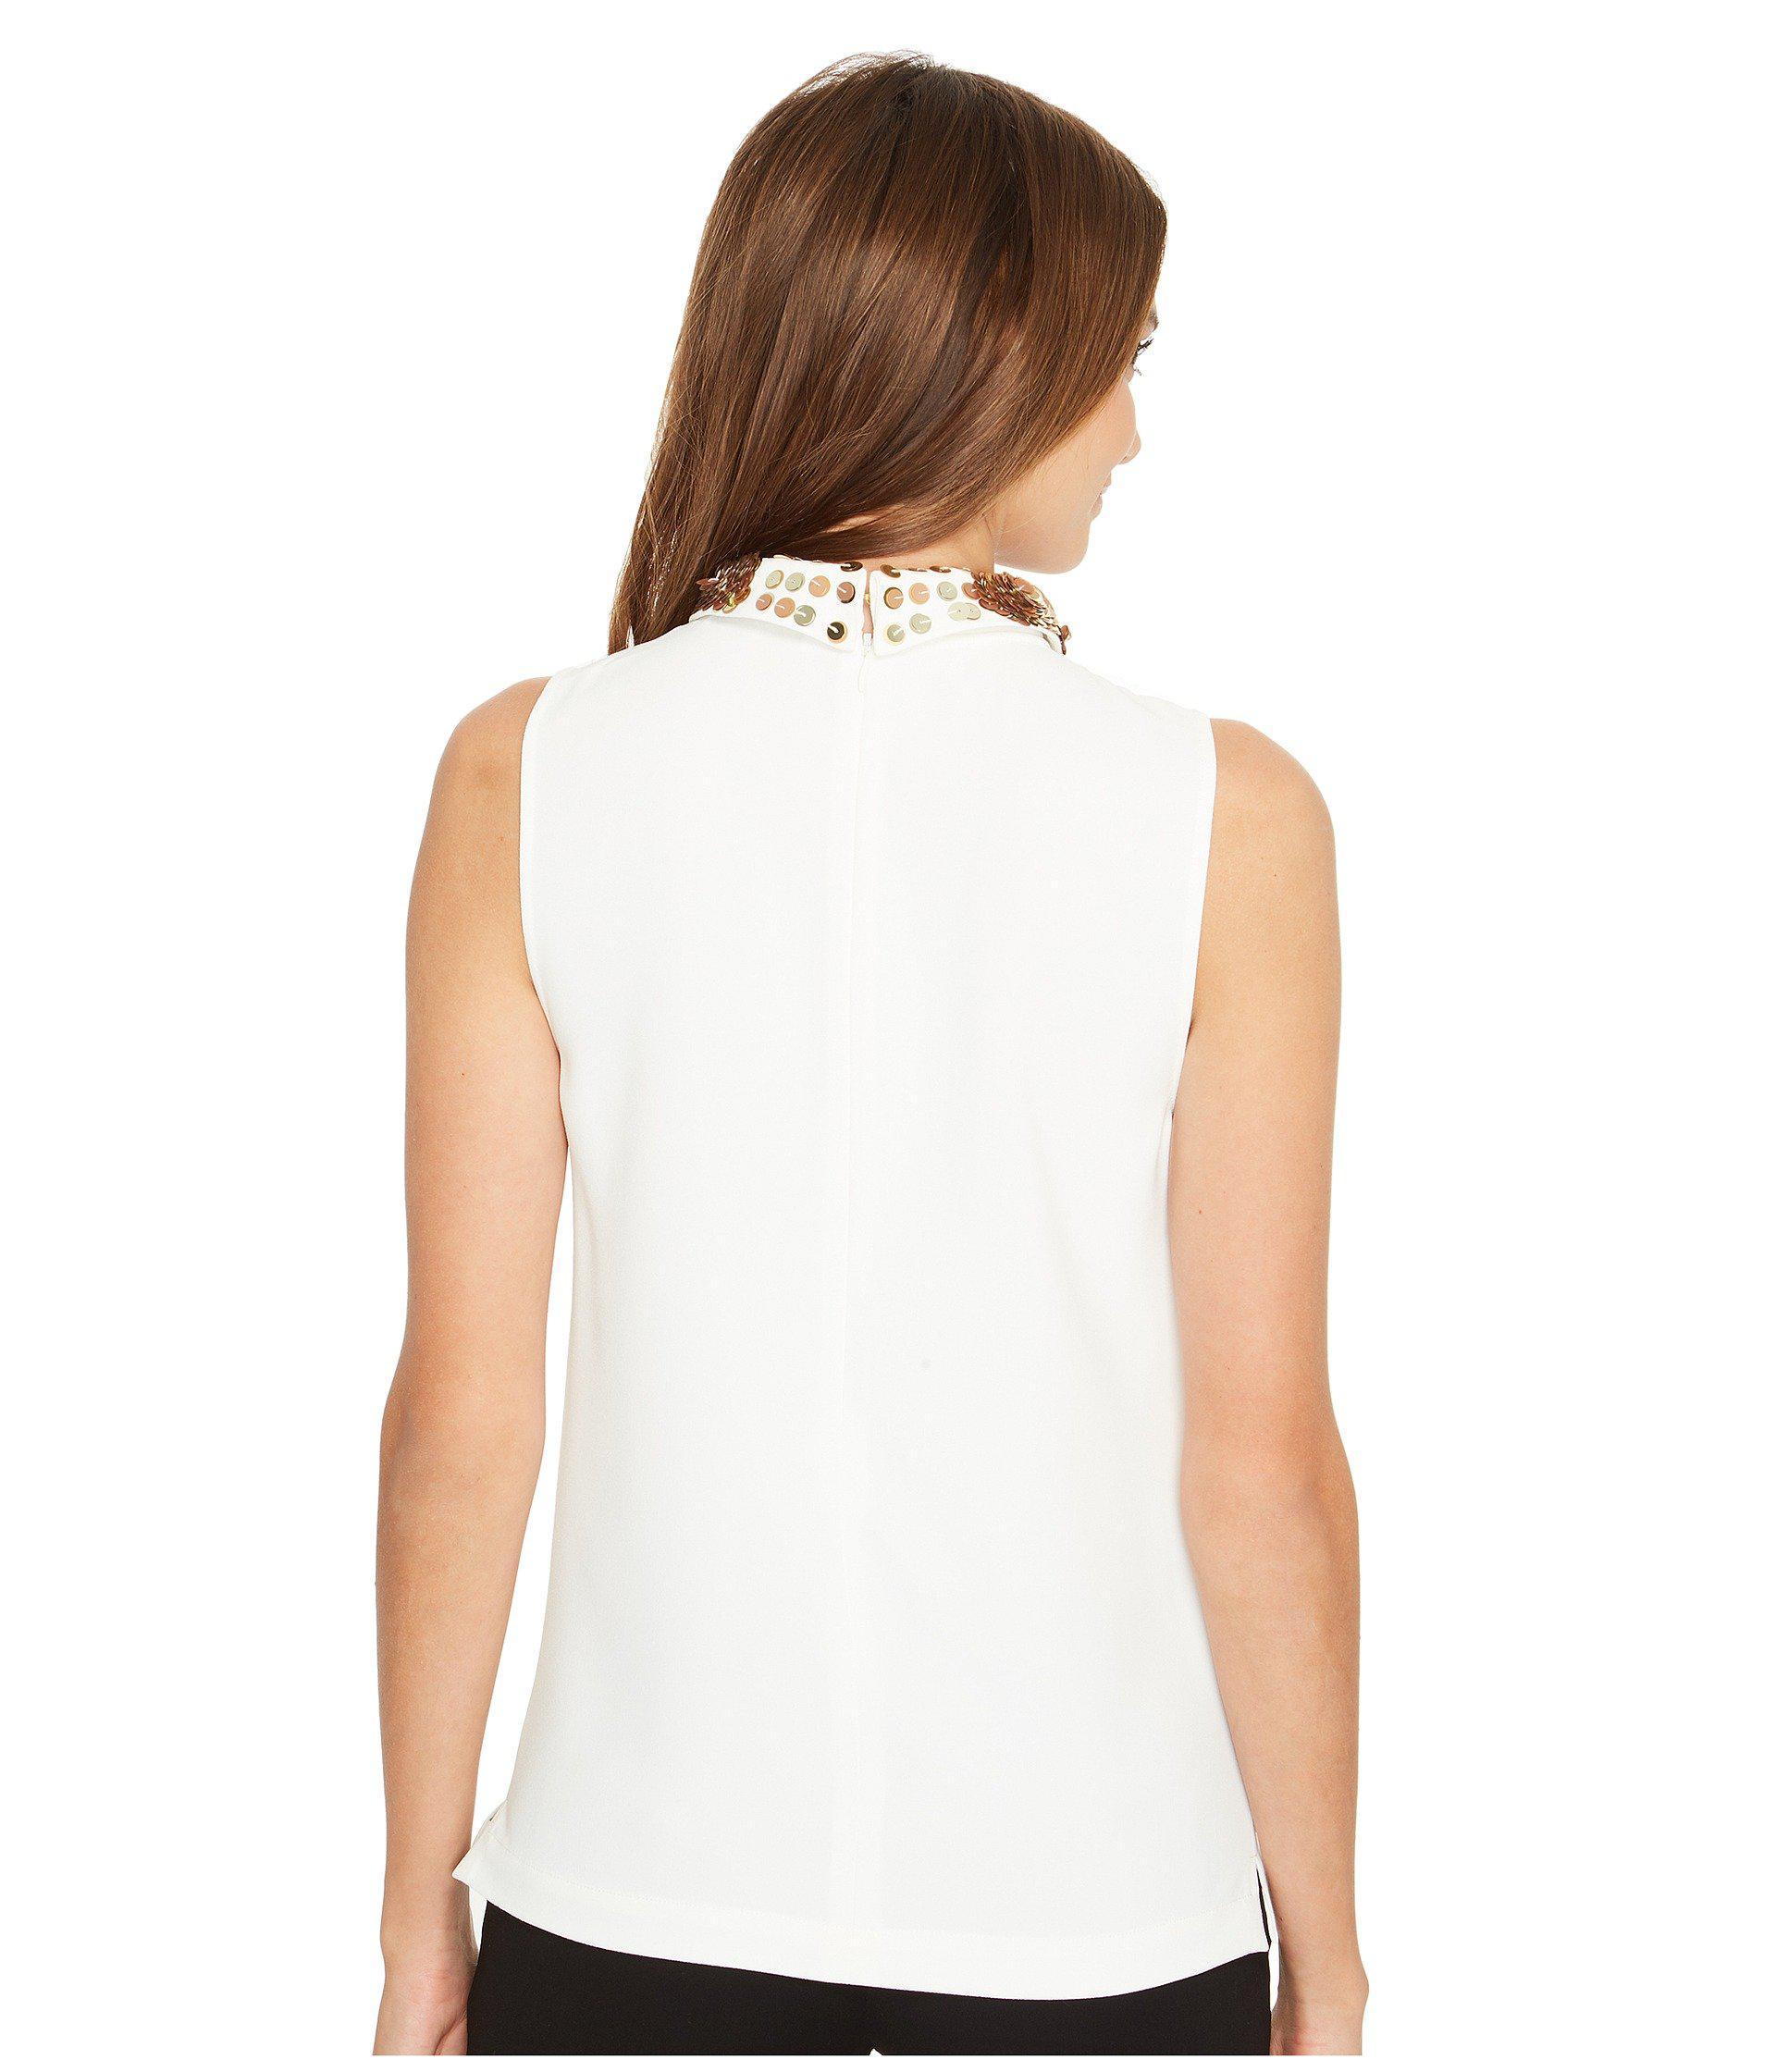 cbfec87ed5b7b2 Lyst - Trina Turk Amaranth 2 Top in White